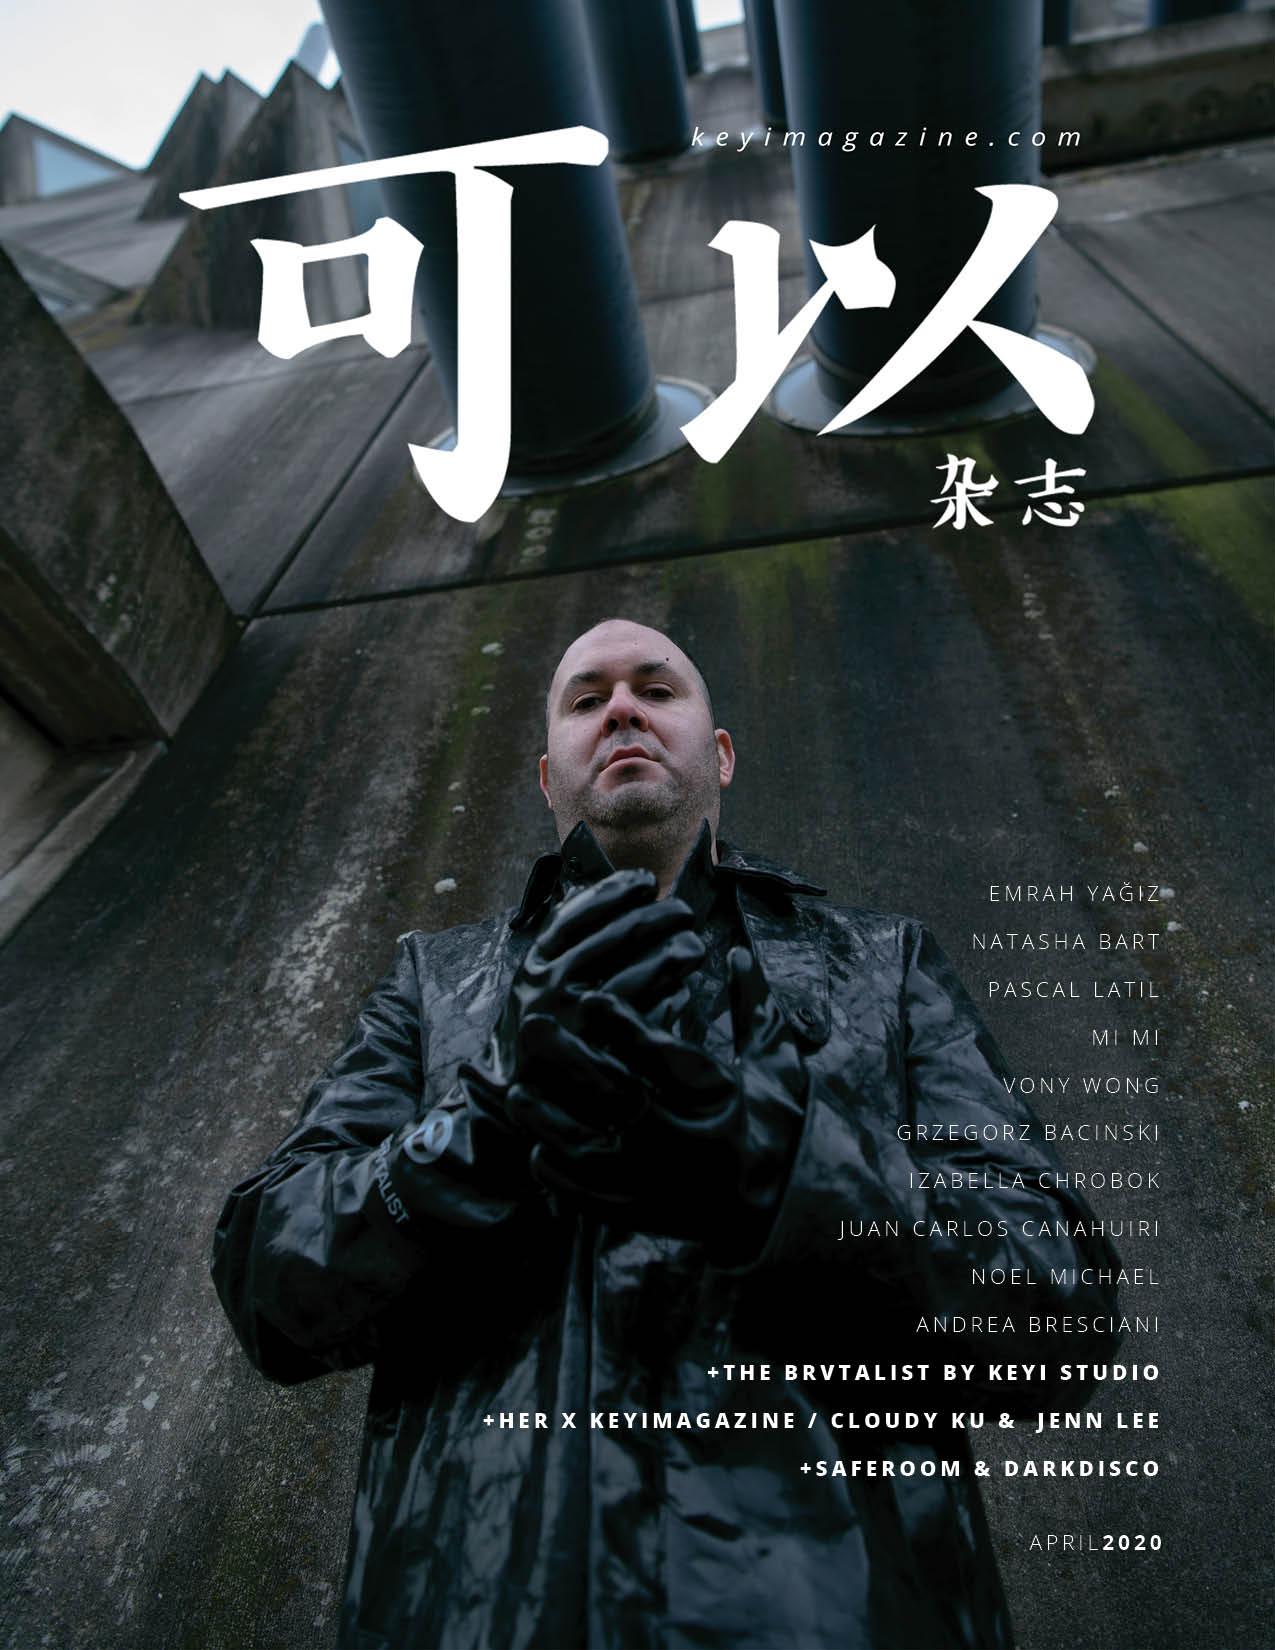 photoshoot of the brvtalist by keyistudio for keyi magazine